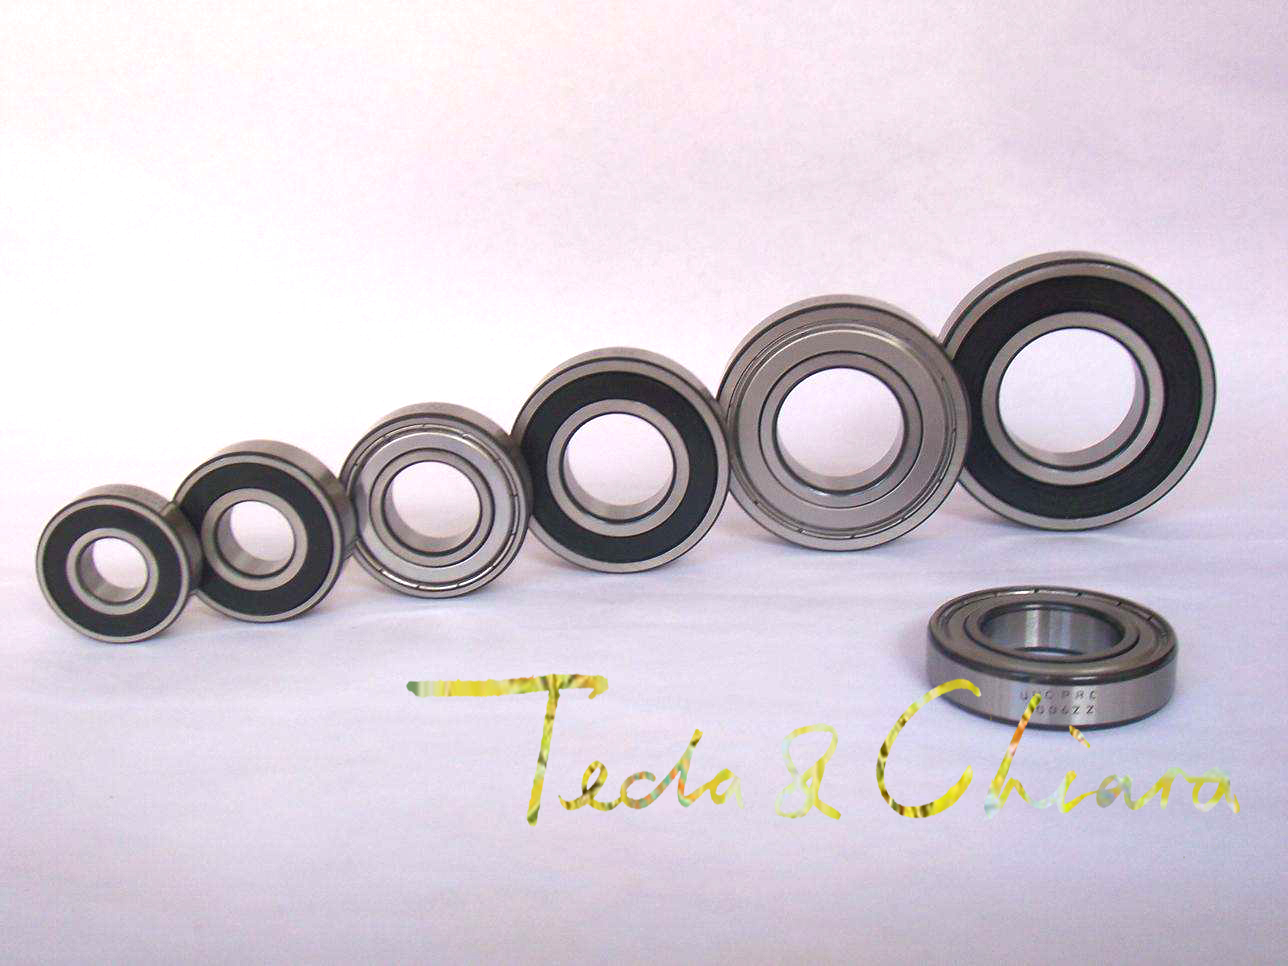 6003 6003ZZ 6003RS 6003-2Z 6003Z 6003-2RS ZZ RS RZ 2RZ Deep Groove Ball Bearings 17 x 35 x 10mm High Quality 5pcs 6201 2rs 6201rs 6201rs 6201 rs deep groove ball bearings 12 x 32 x 10mm free shipping high quality